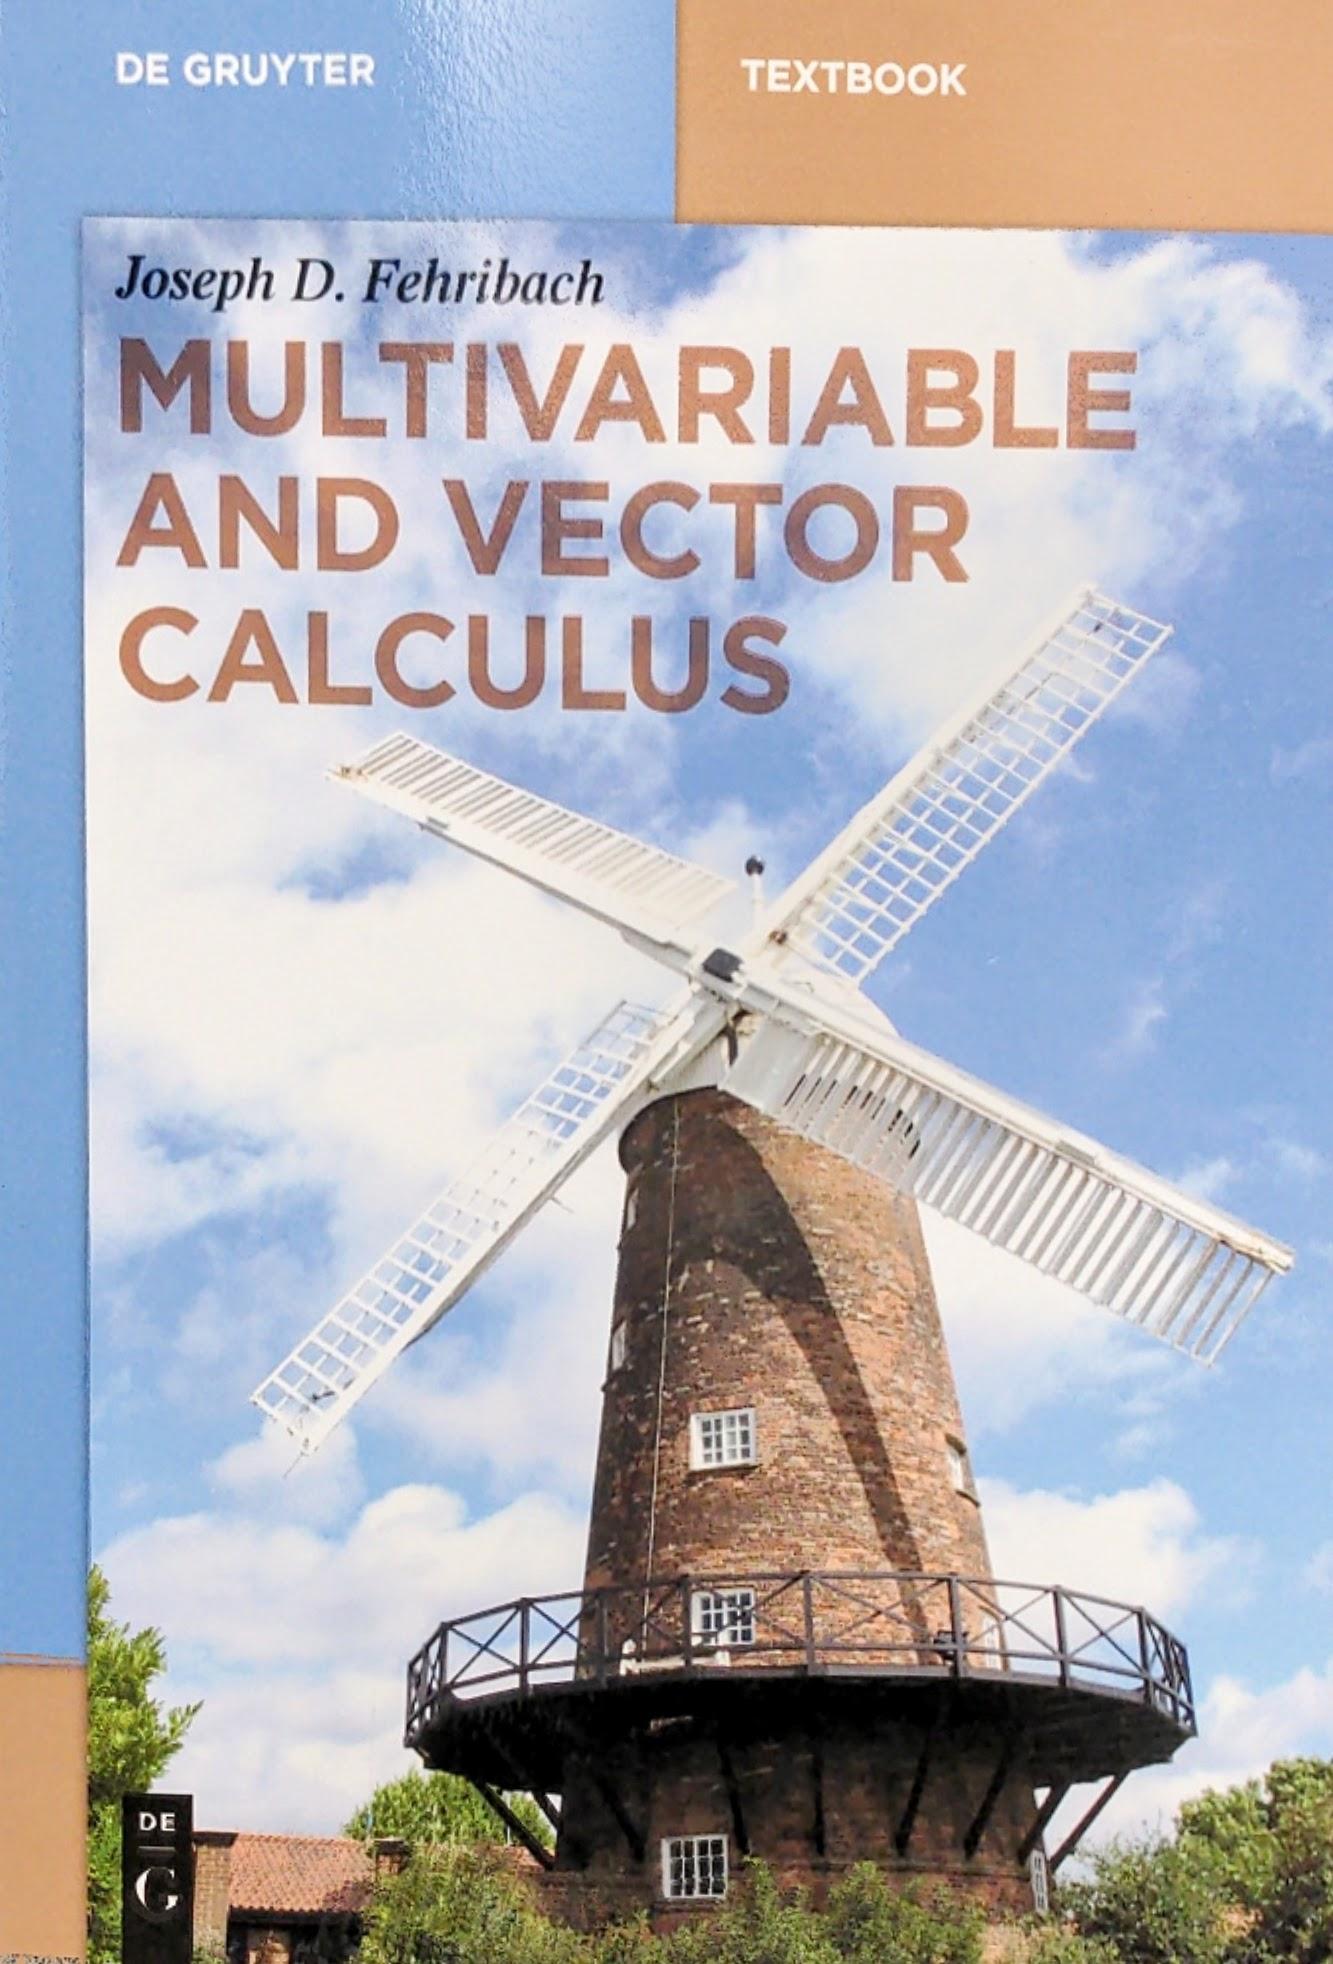 Joseph Fehribach Multivariable and Vector Calculus